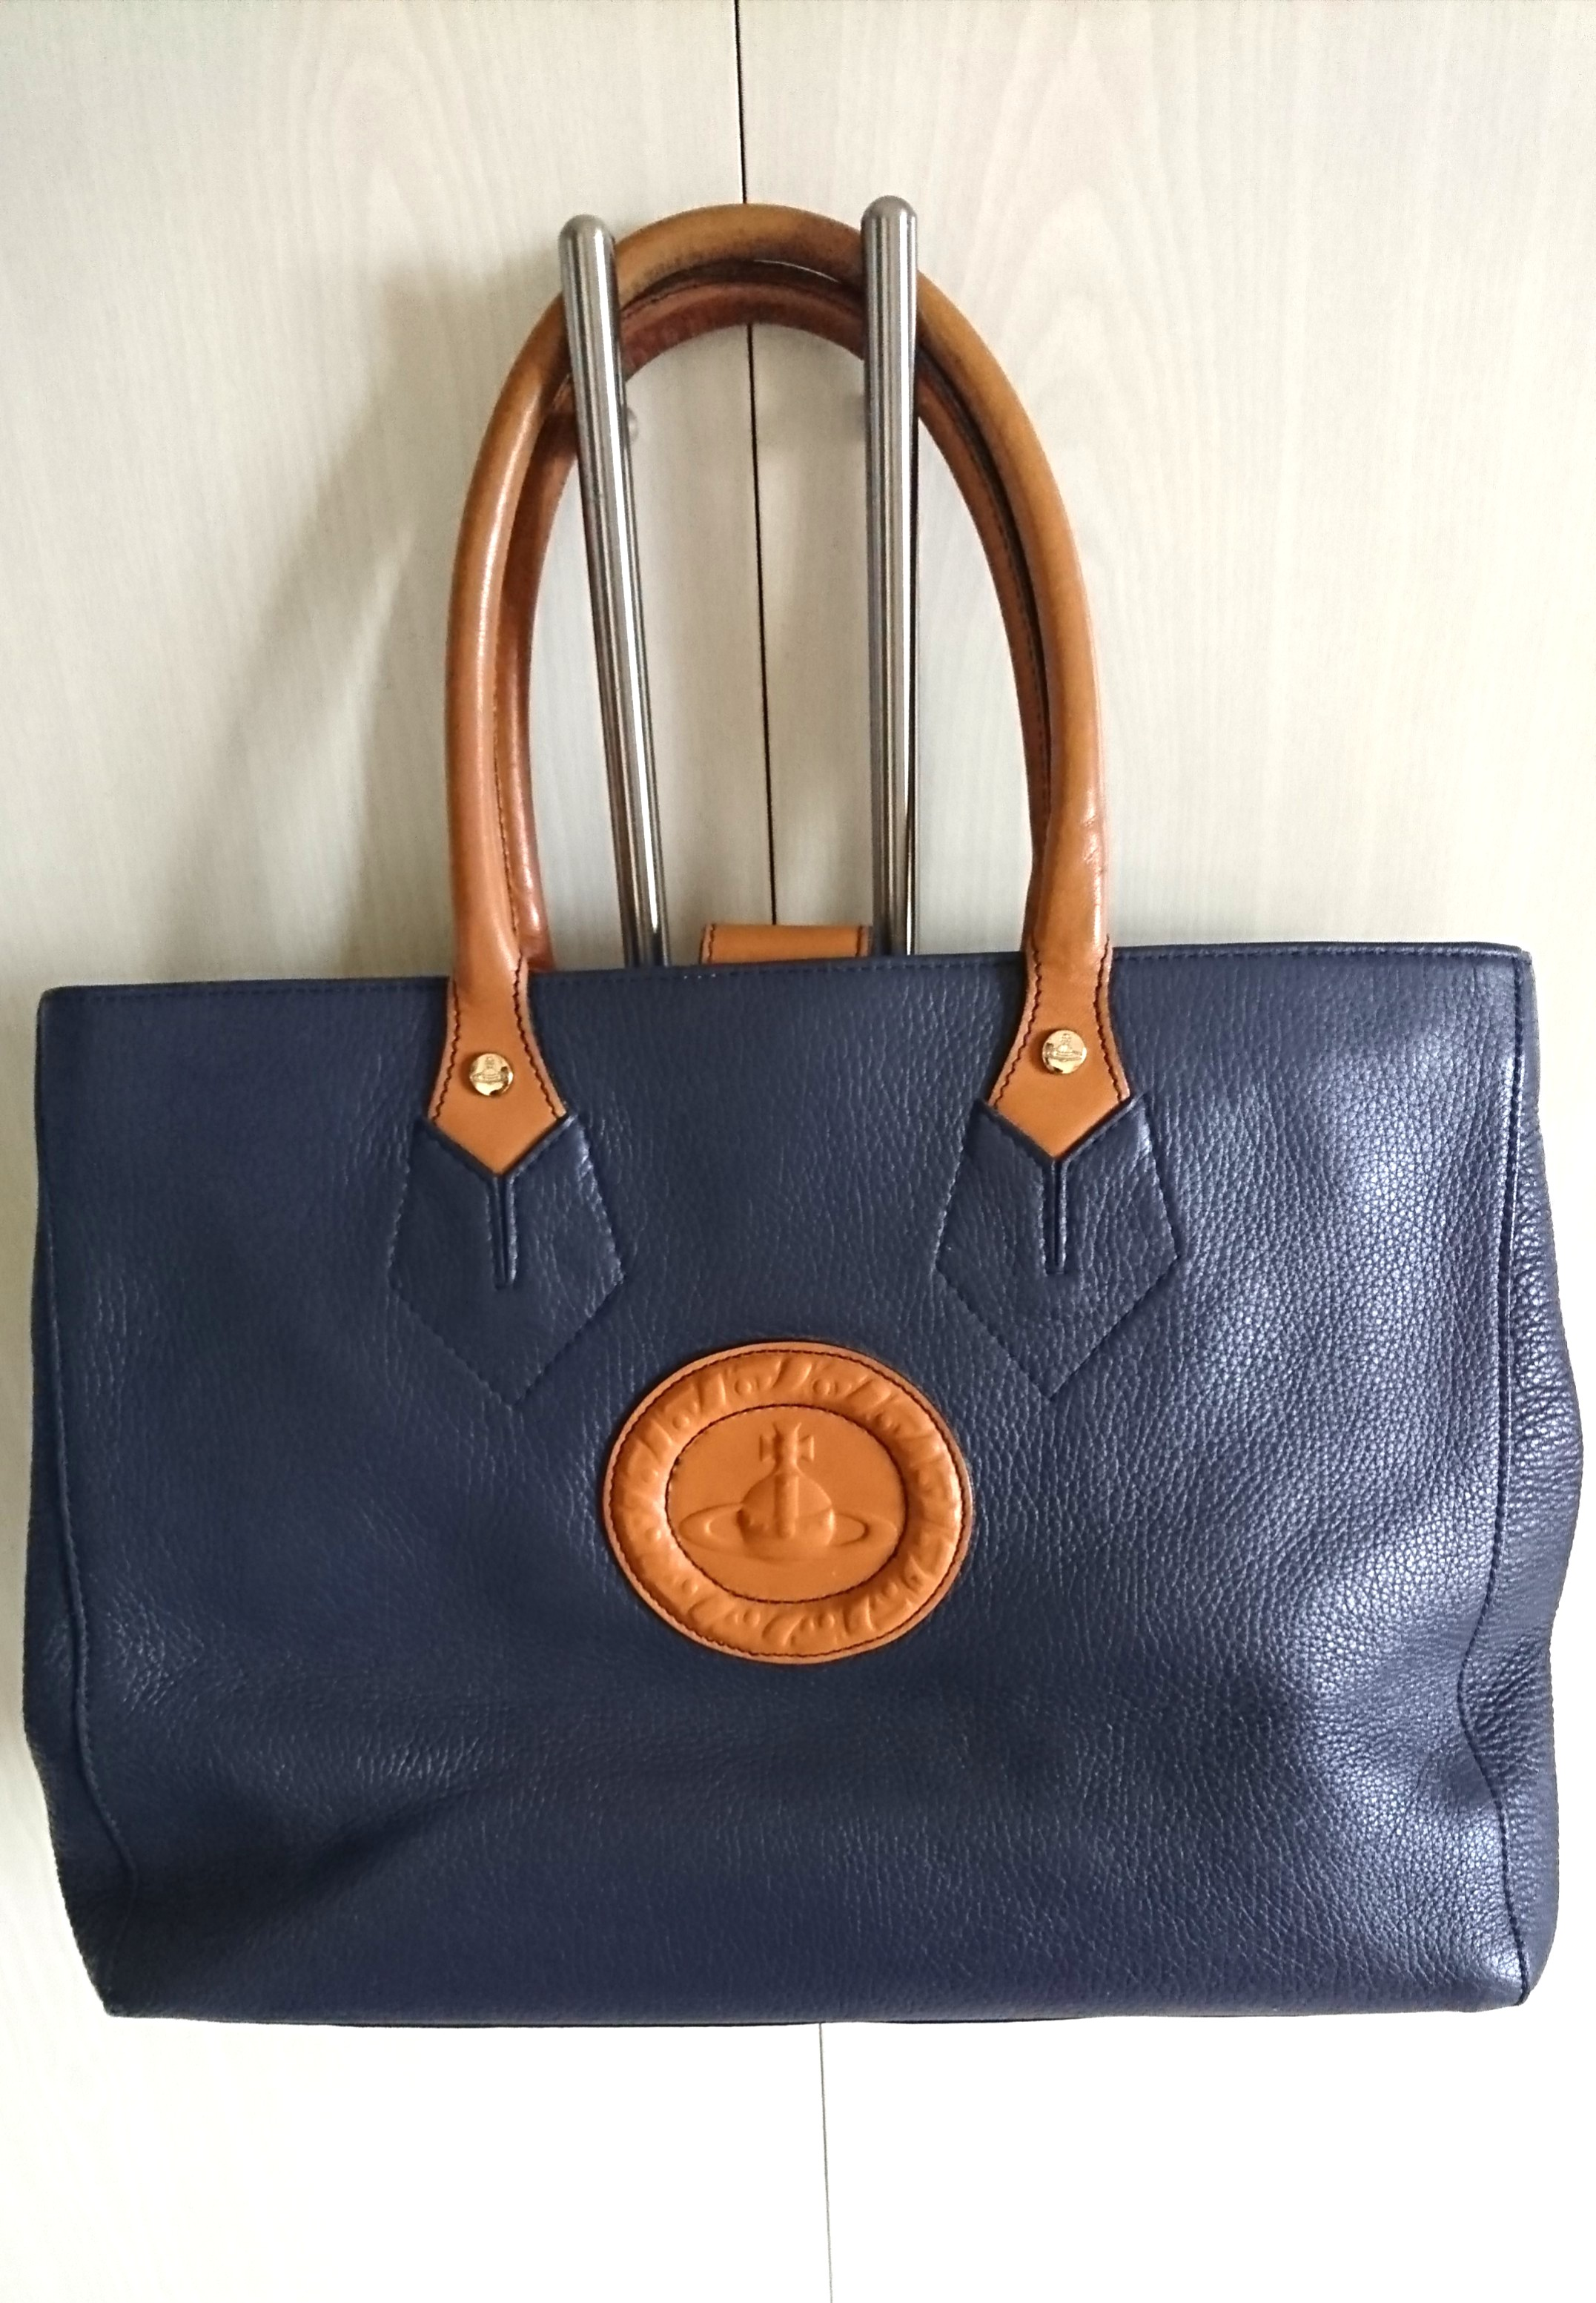 21c8d97240 Vivienne Westwood Handbag, Luxury, Bags & Wallets, Handbags on Carousell